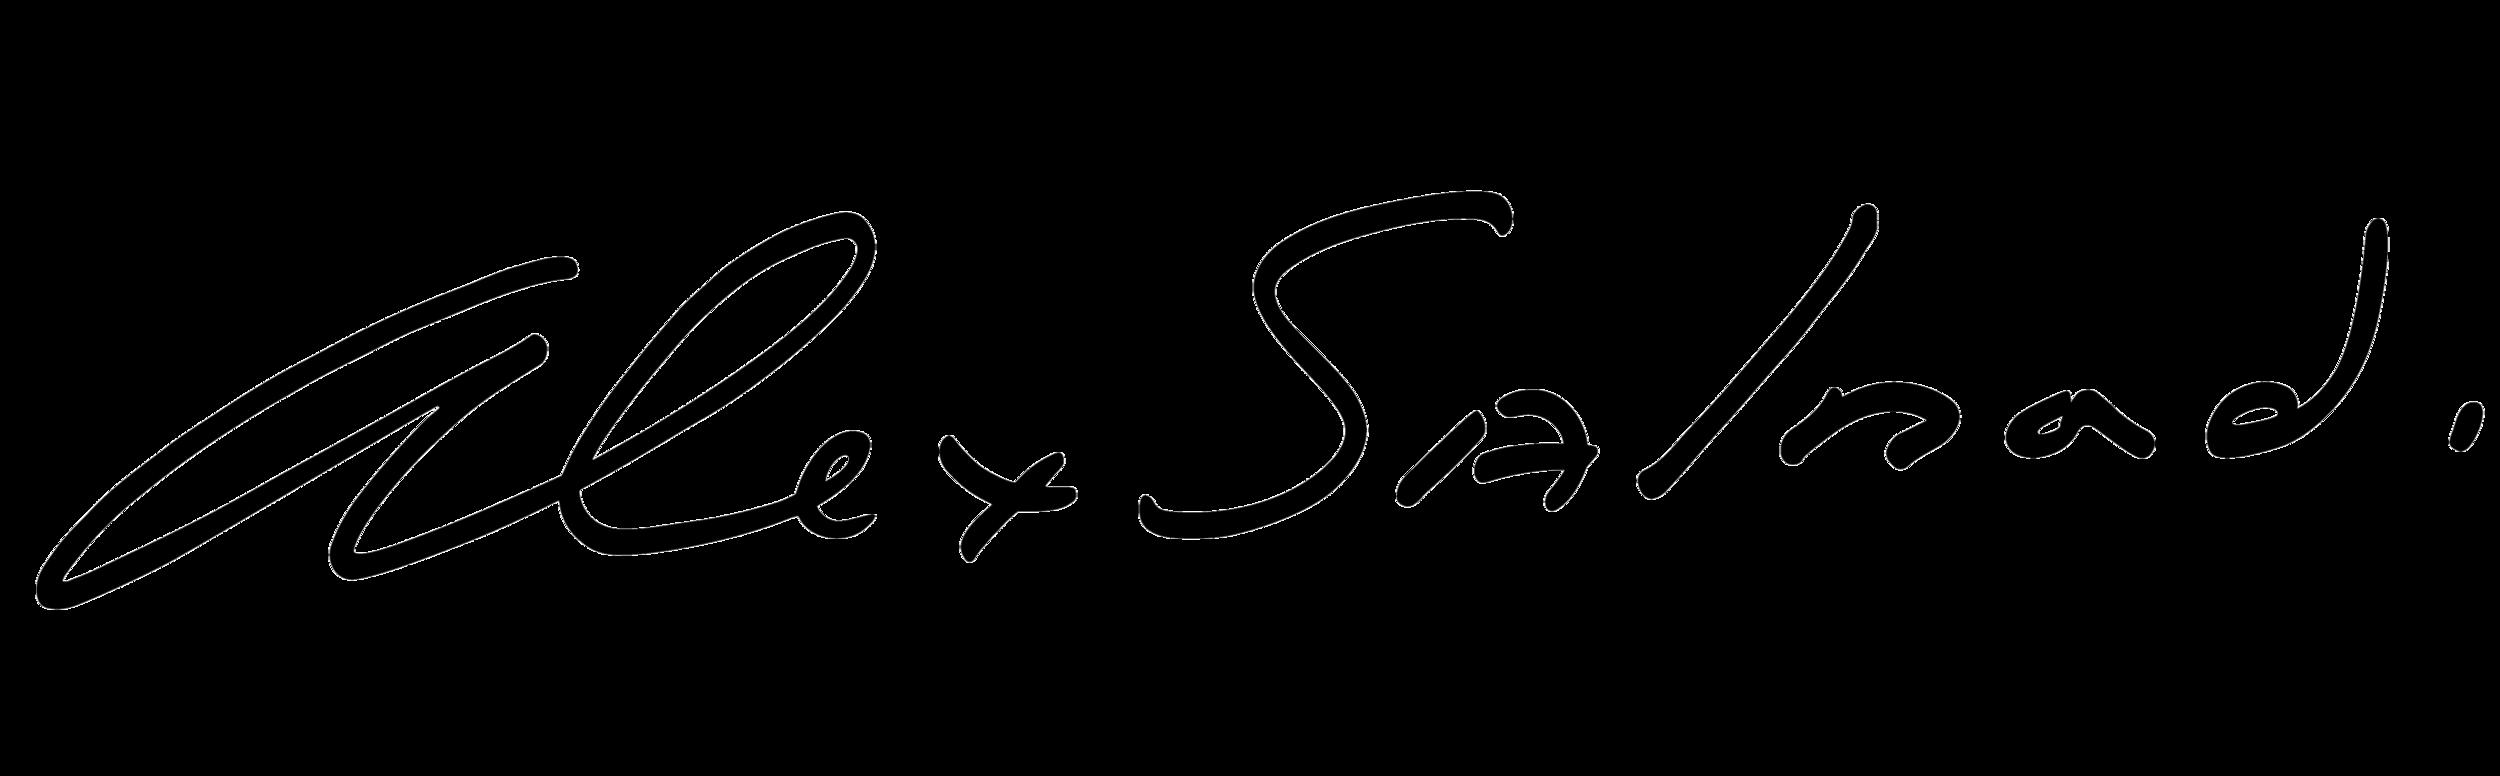 Black Alex Salmond signature